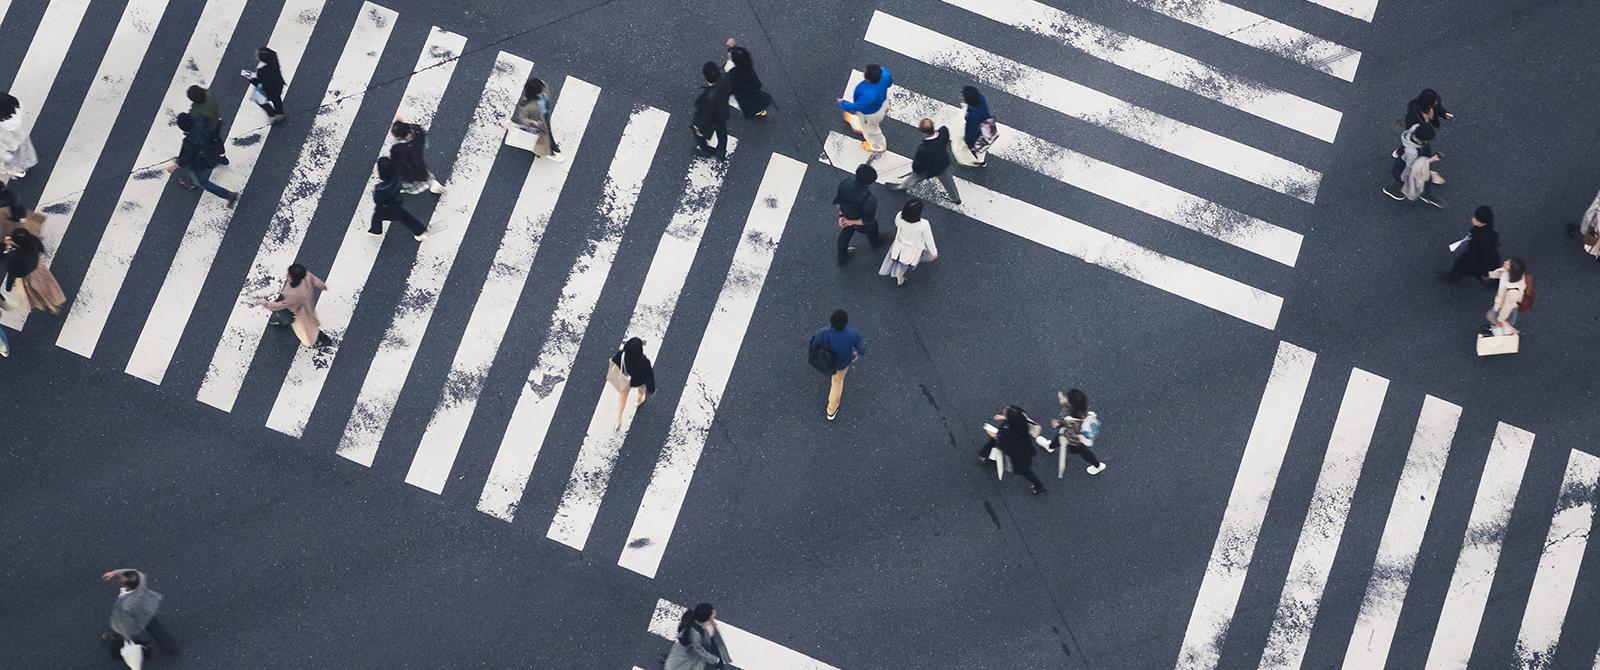 People at a crosswalk